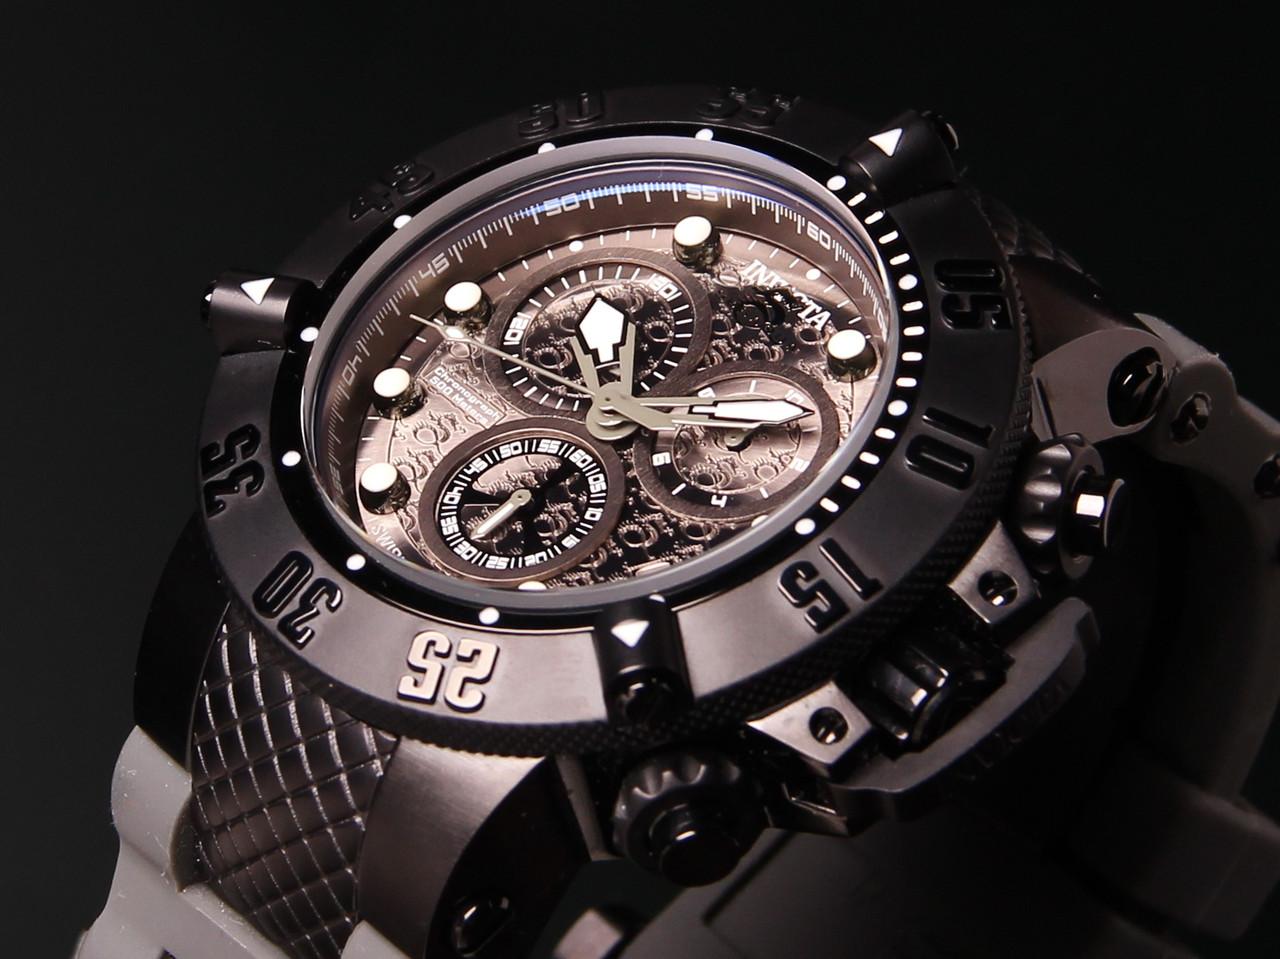 759c56d2 Мужские часы Invicta 15144 Subaqua Noma III - ФЛП Костюшко в Харькове